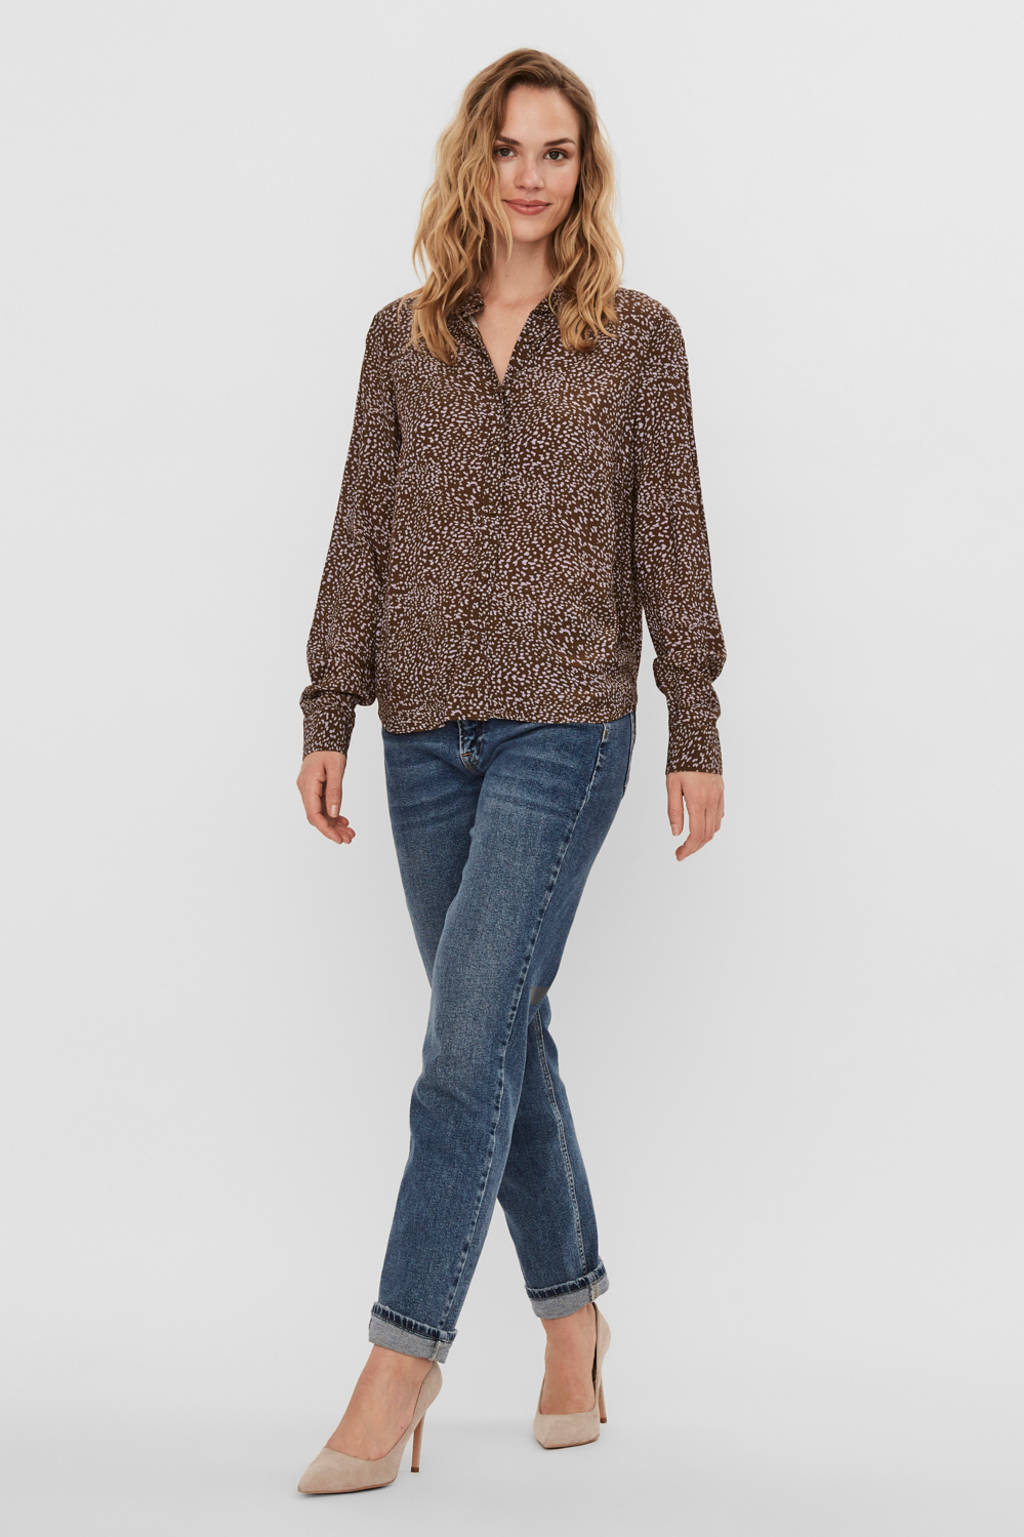 VERO MODA blouse Cammo met all over print bruin/wit, Bruin/wit